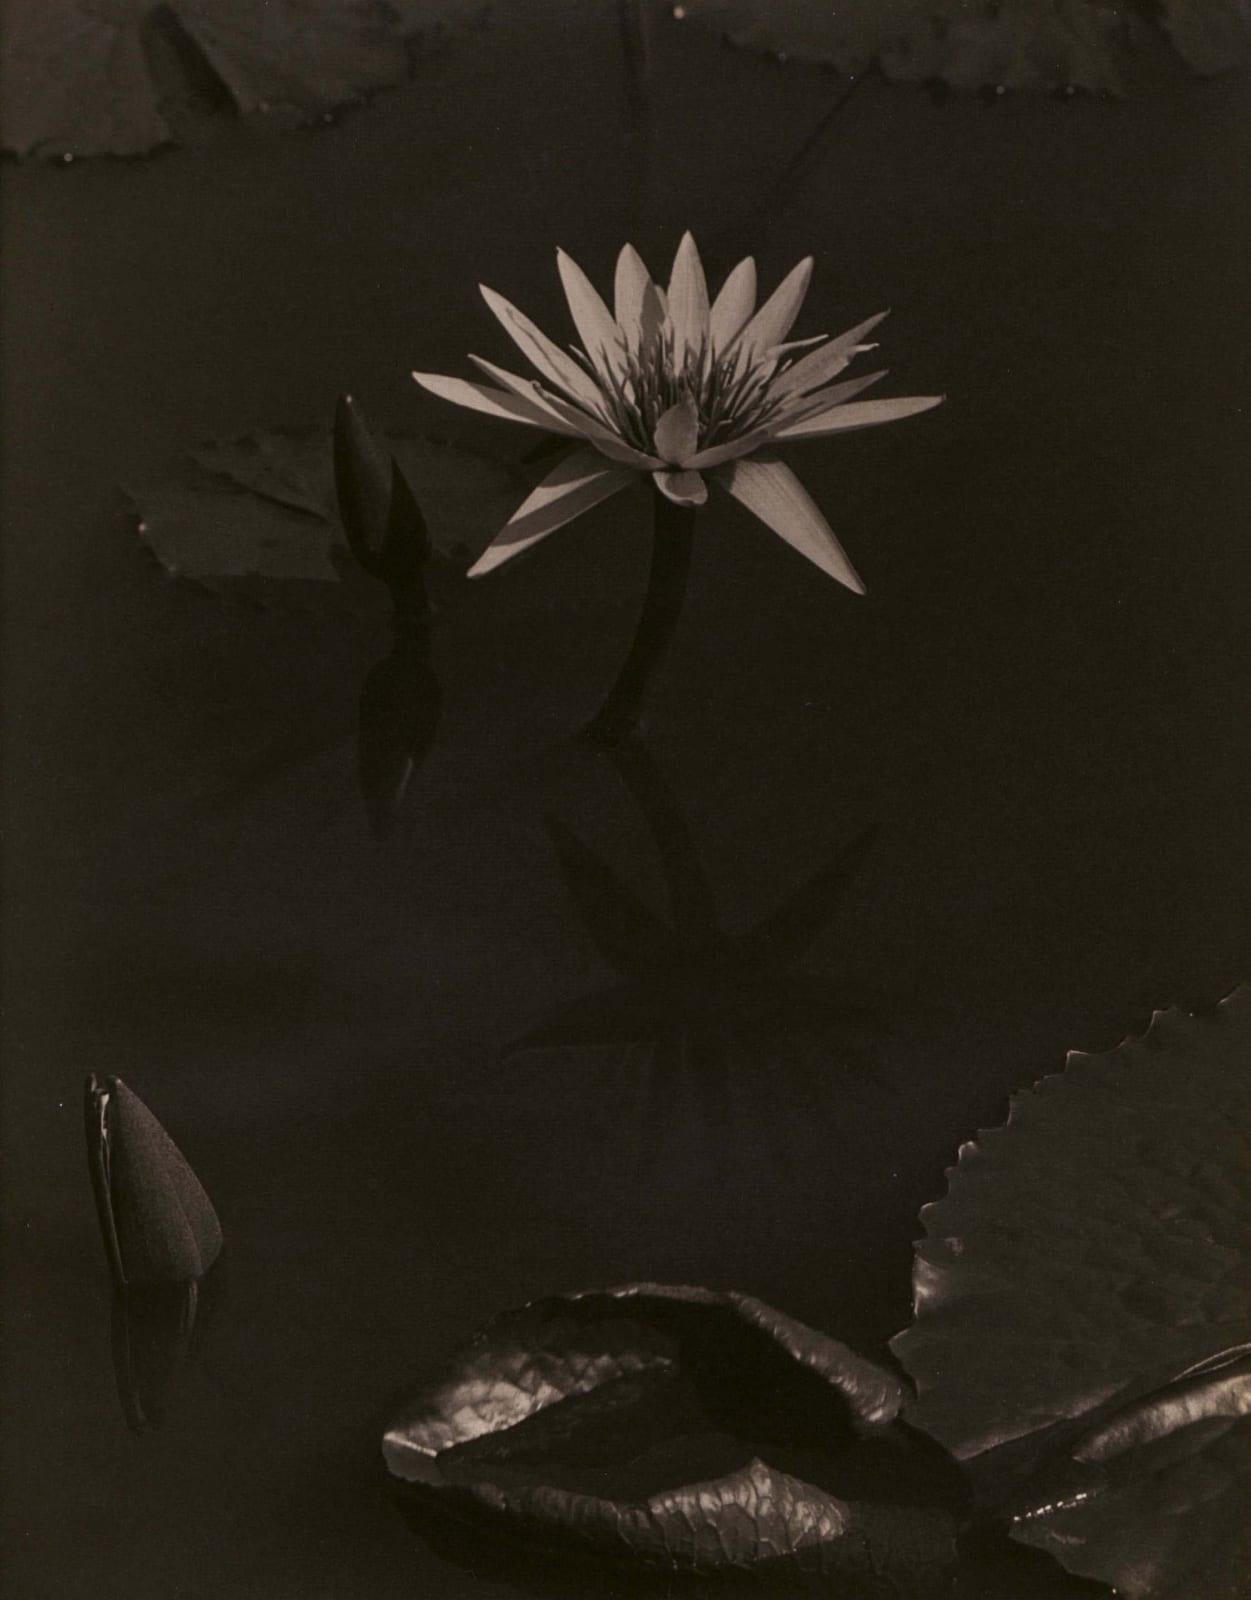 Charles Sheeler, Lily, Mount Kisco, 1918-19